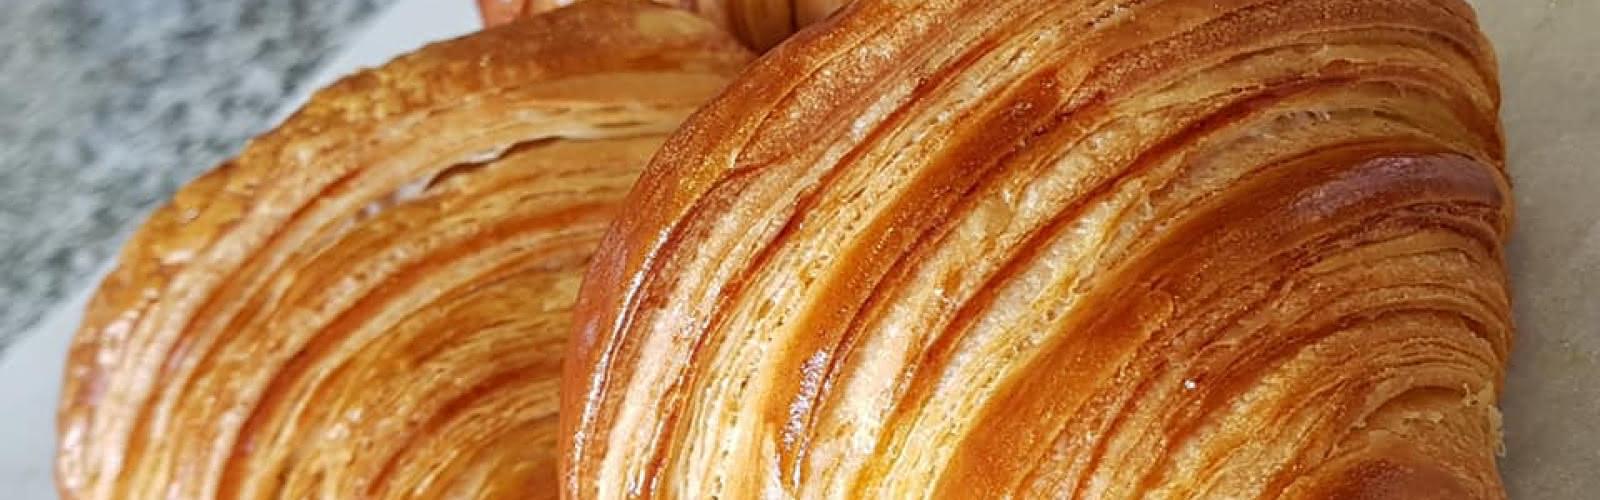 Boulangerie Pâtisserie Gautier